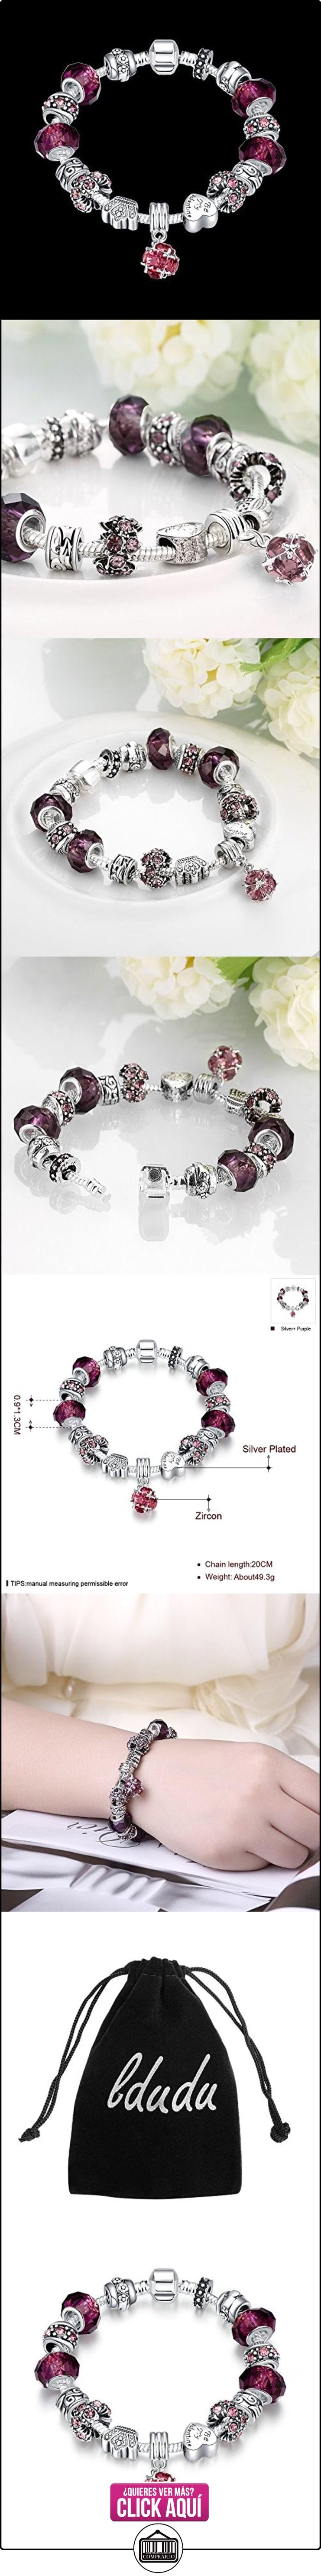 5a5577ea023a LDUDU® Pulsera charms de mujer plateado de plata con charms de cristal de  murano púrpura